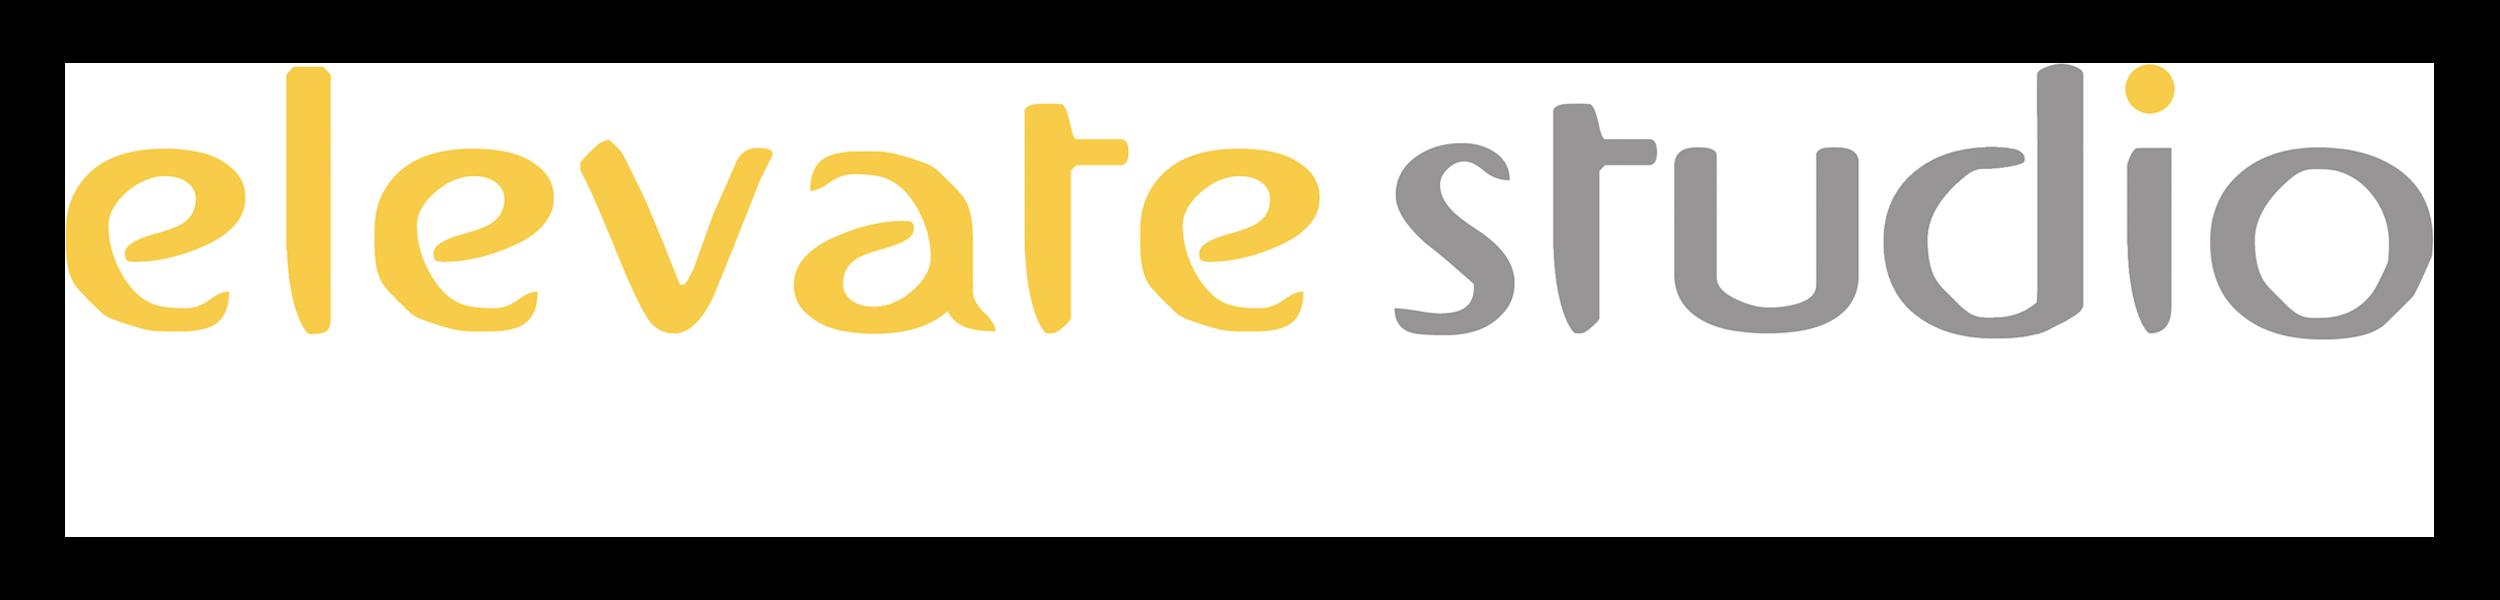 Elevate Studio